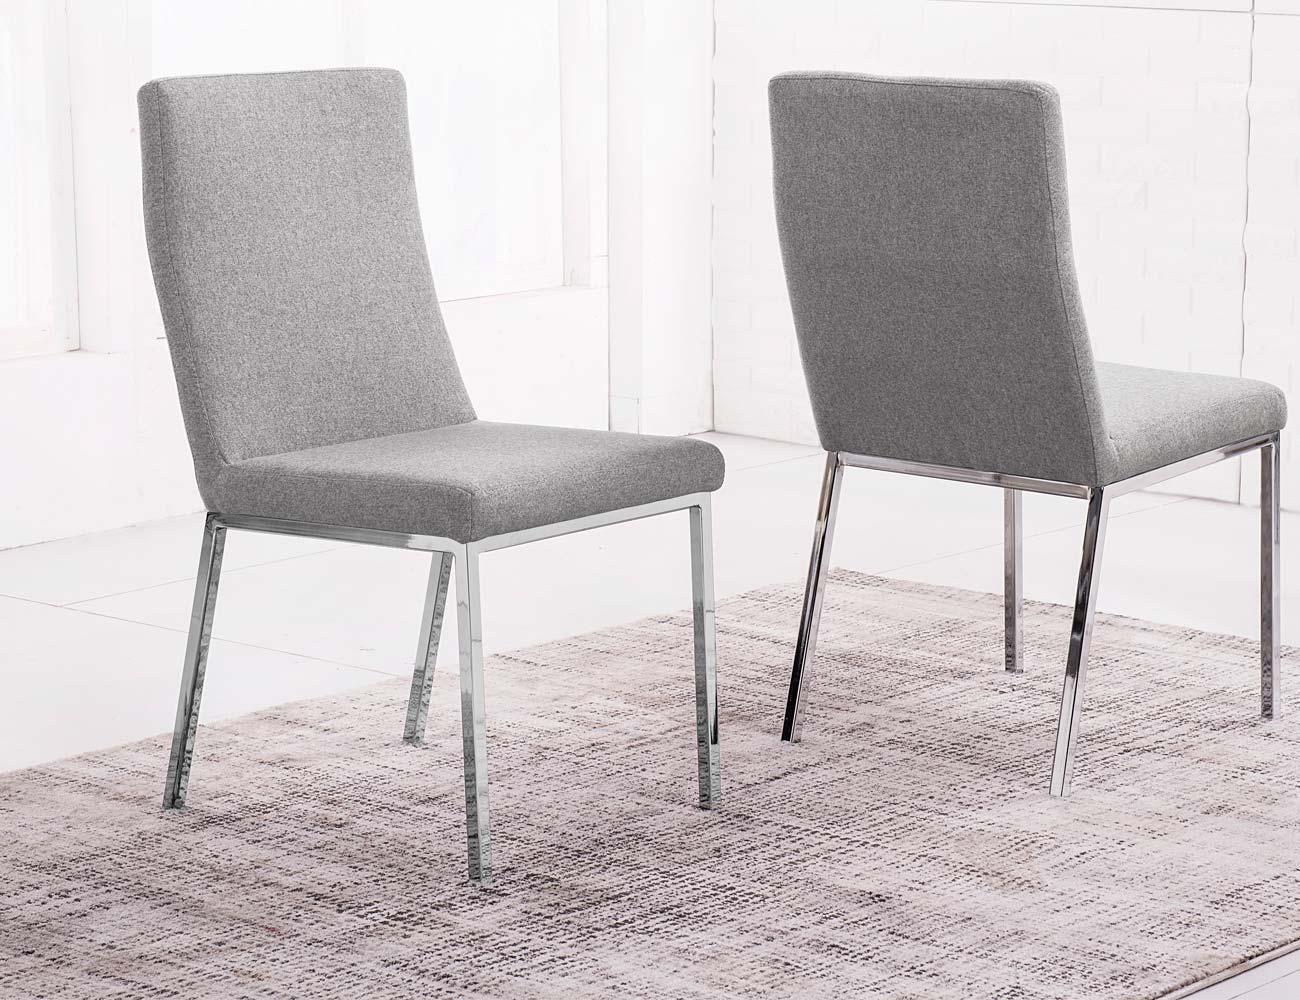 Sillas de comedor tapizadas cool sillas de comedor for Sillas comedor tapizadas baratas